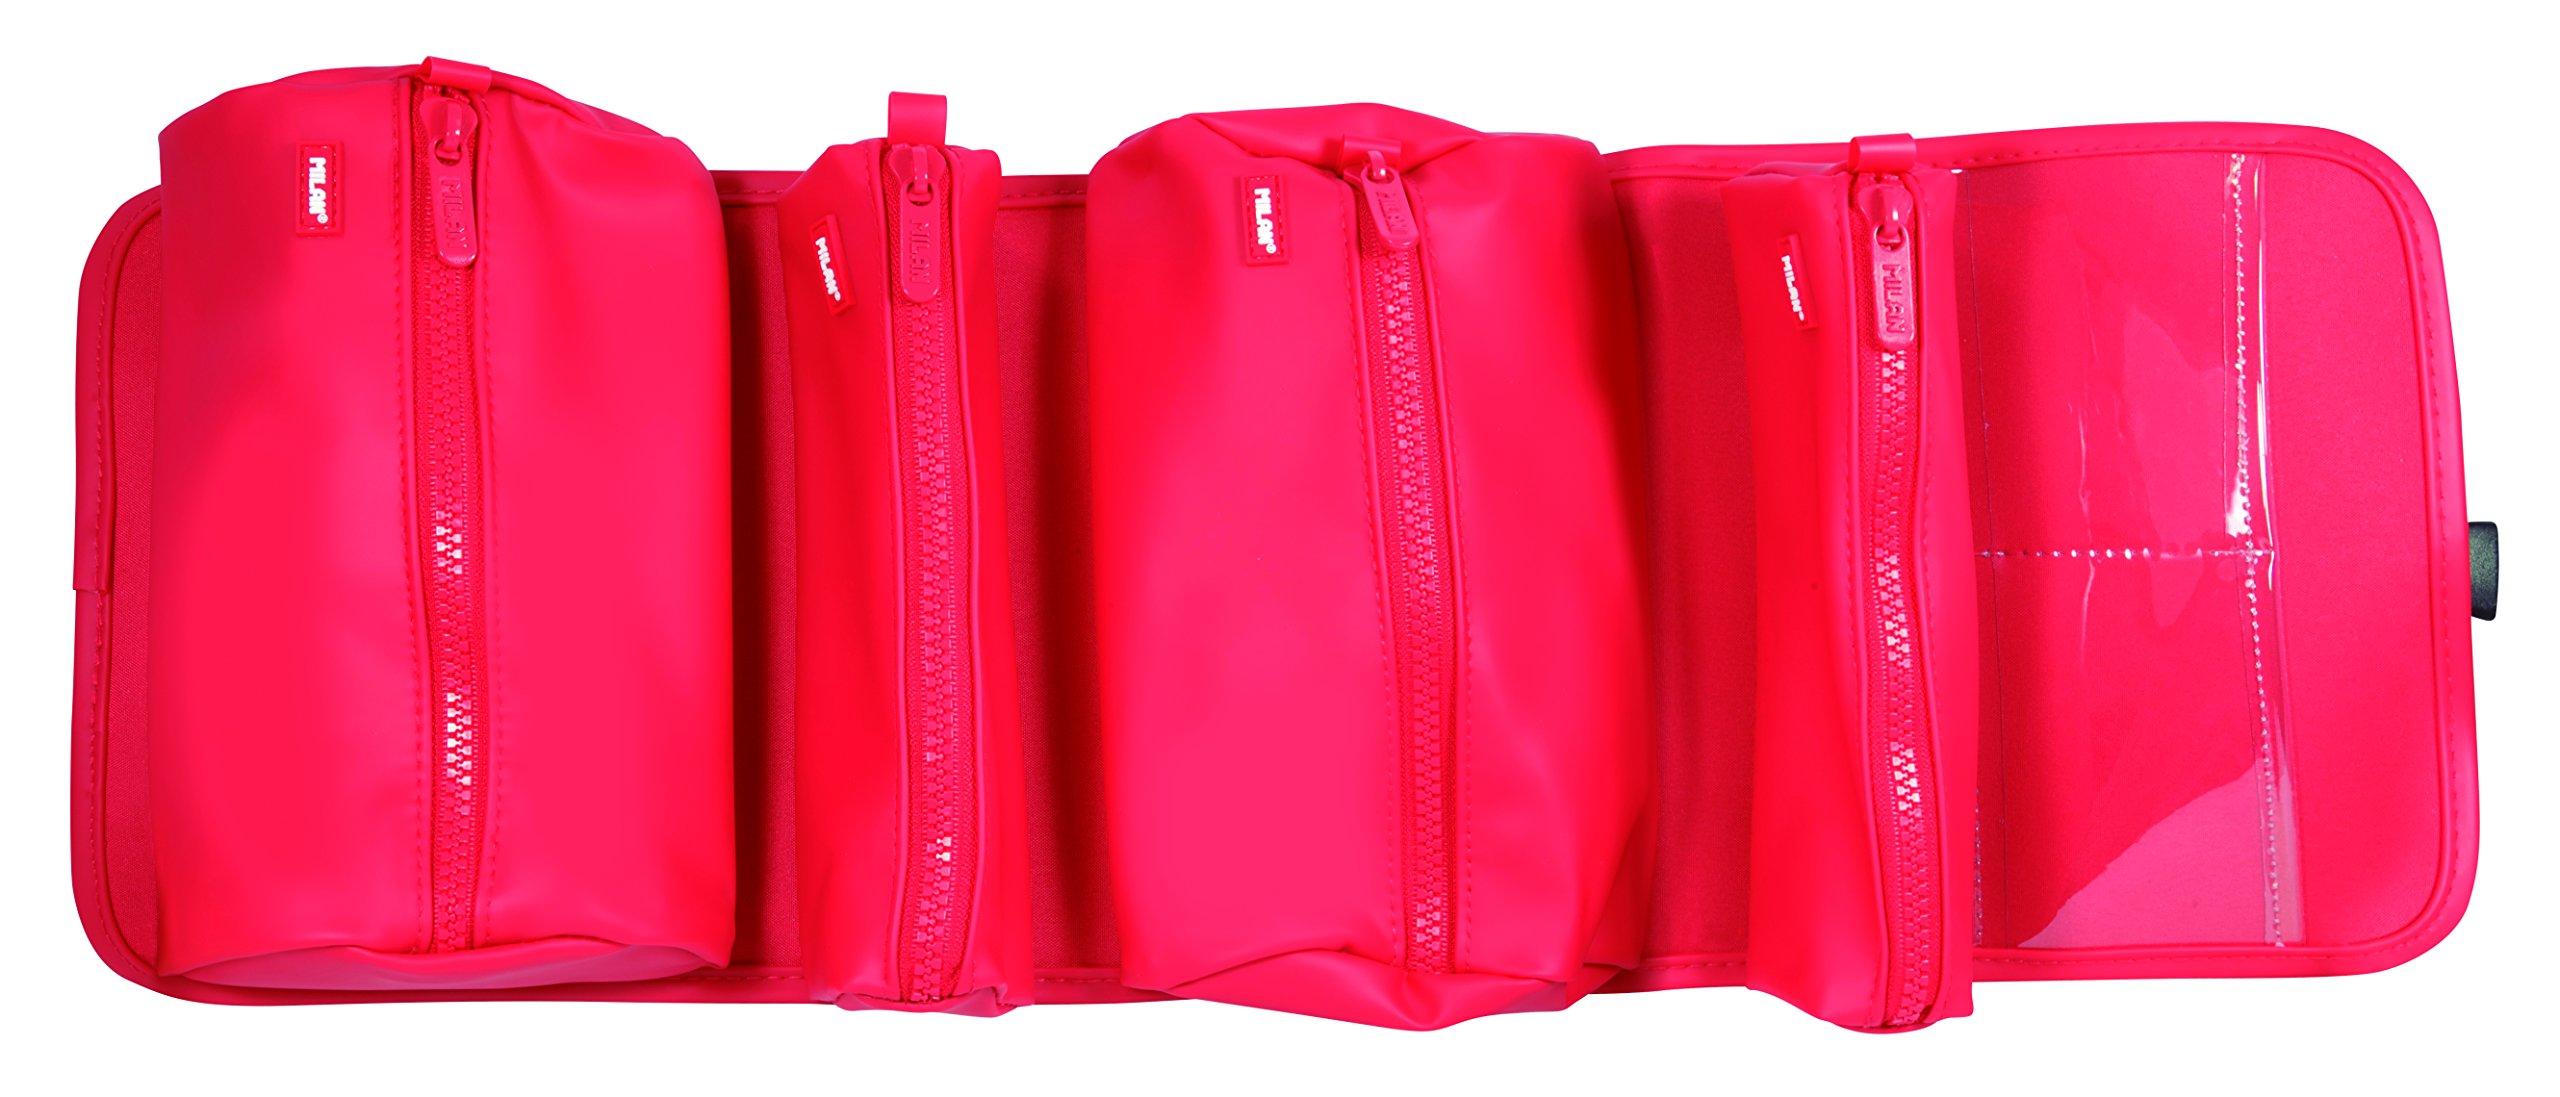 719EIw%2B%2BjcL - Milan Matt Touch Estuches, 21 cm, Rojo